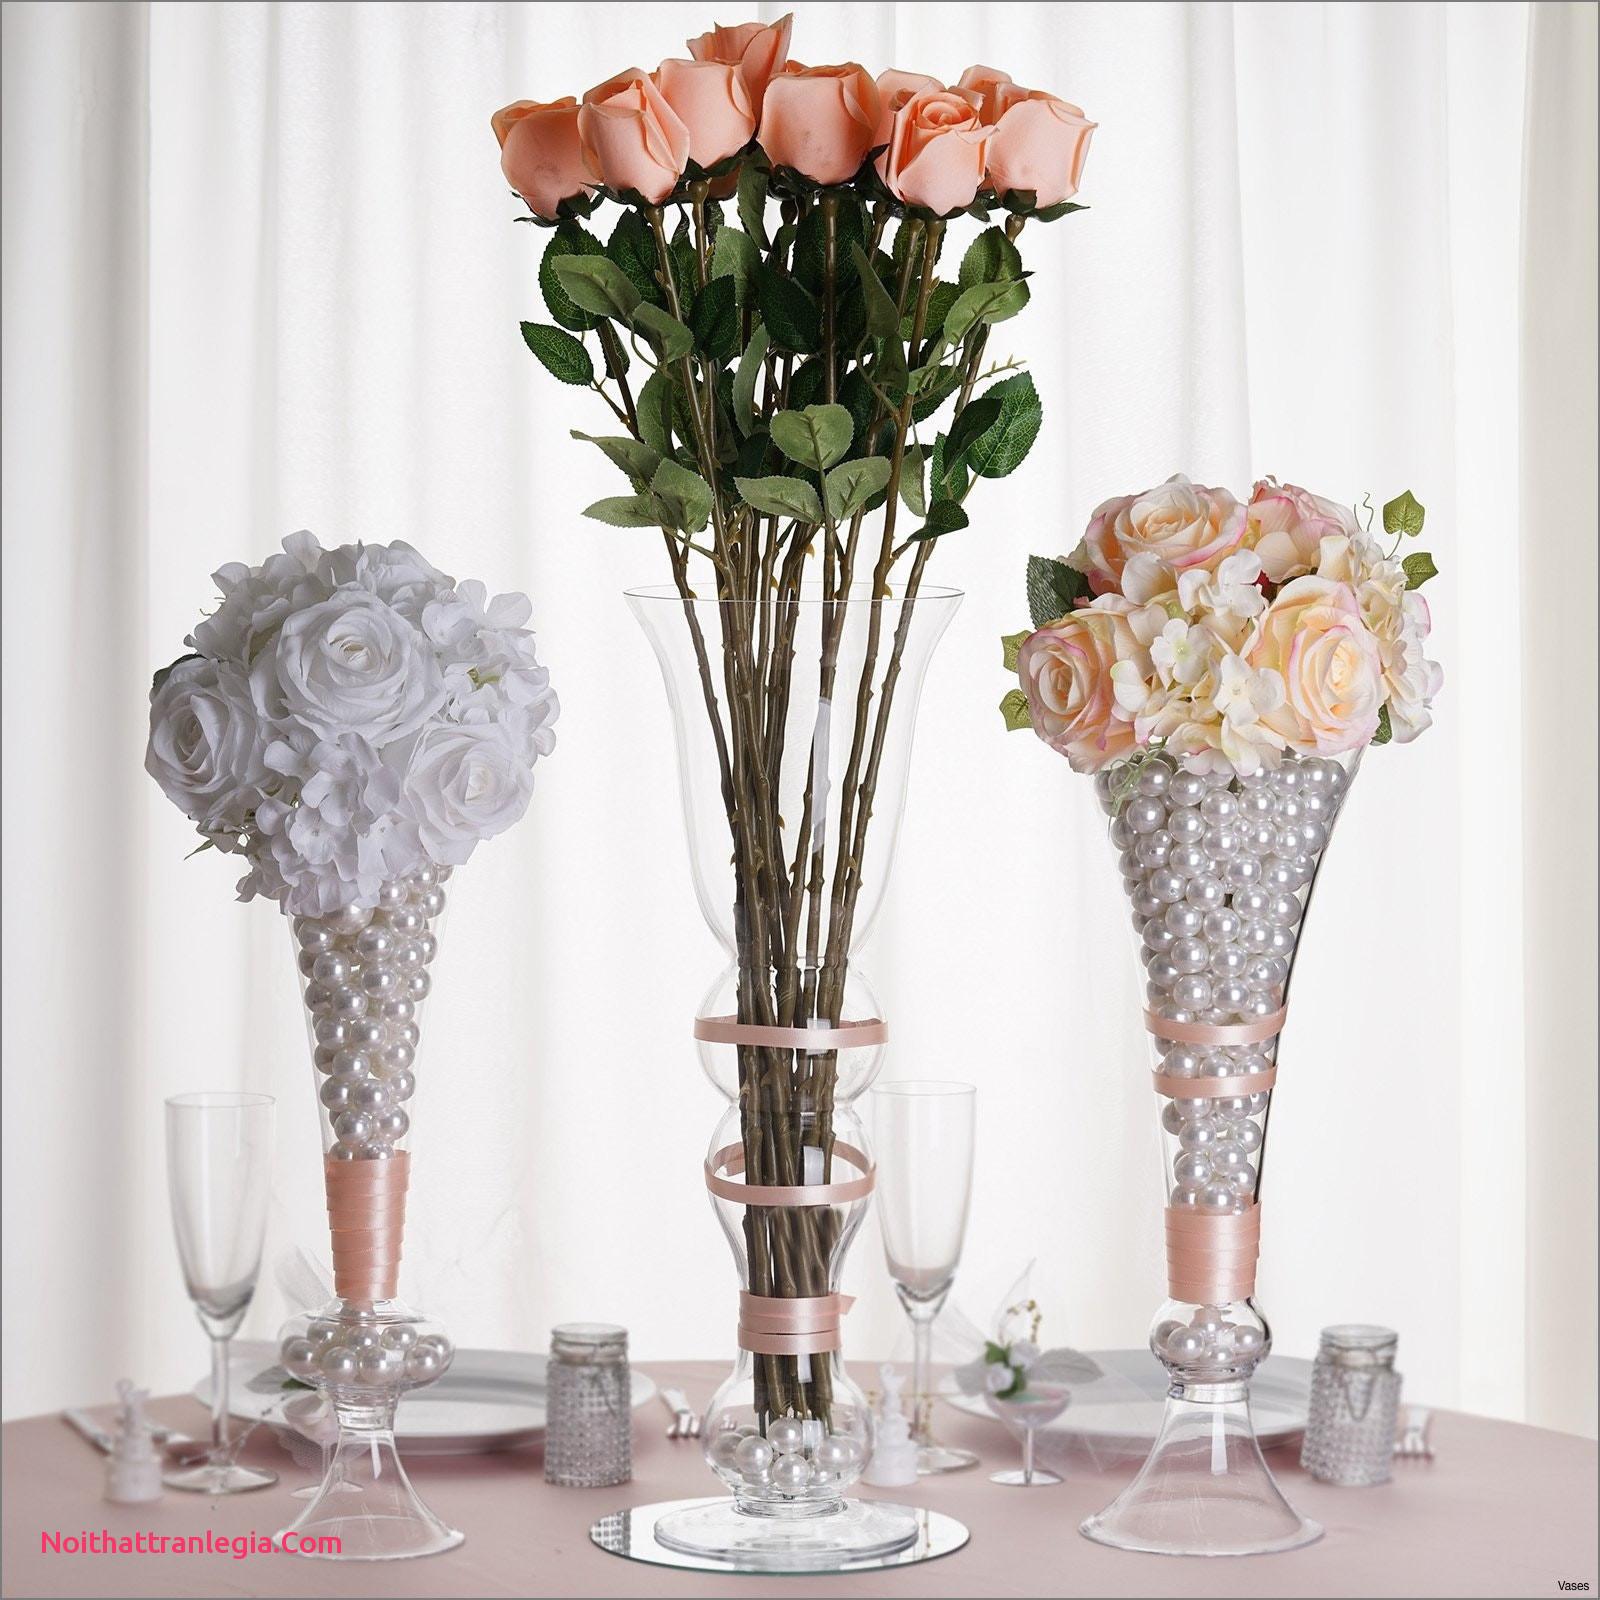 flower vases near me of 20 how to clean flower vases noithattranlegia vases design pertaining to update clipart awesome flower vase table 04h vases tablei 0d clipart dining base end design